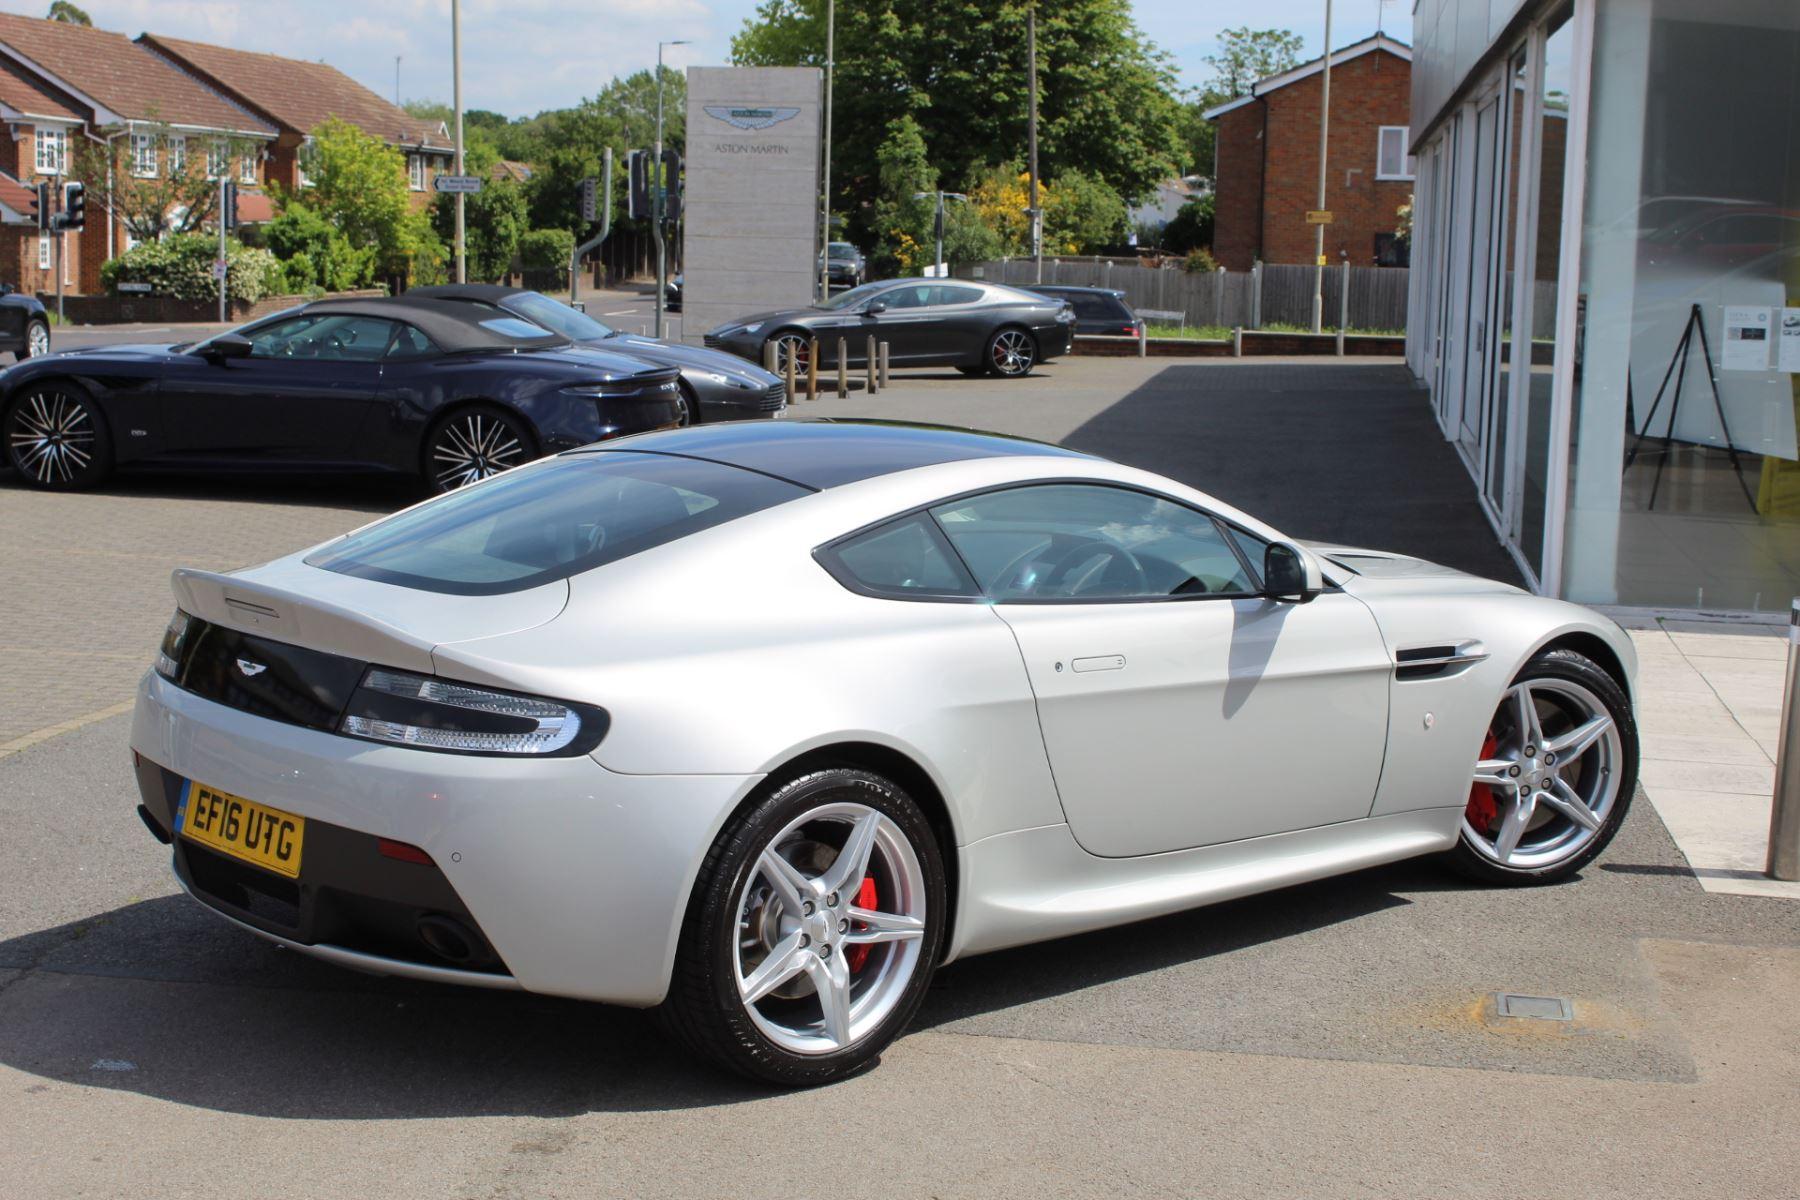 Aston Martin V8 Vantage Coupe 2dr [420] Latest Dash, 420BHP image 14